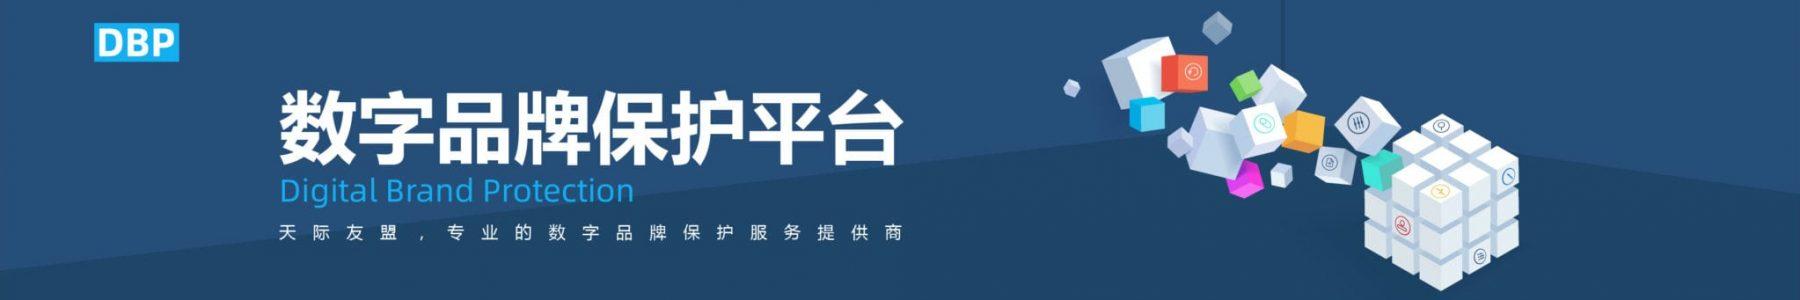 威胁情报-品牌保护-banner-02